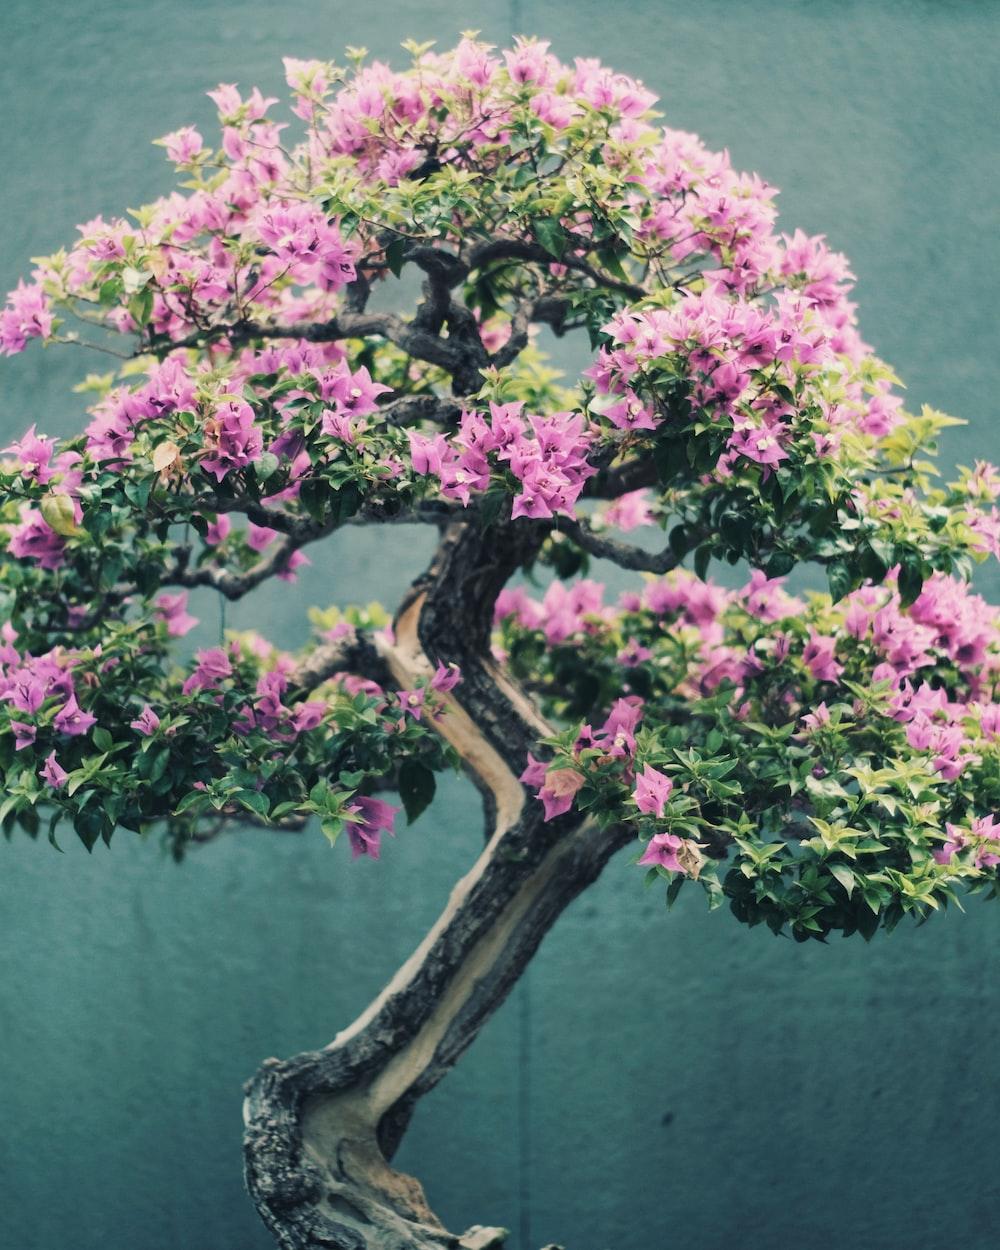 Beautuful Nature Bonsai Tree And Bonsai Hd Photo By Timothy